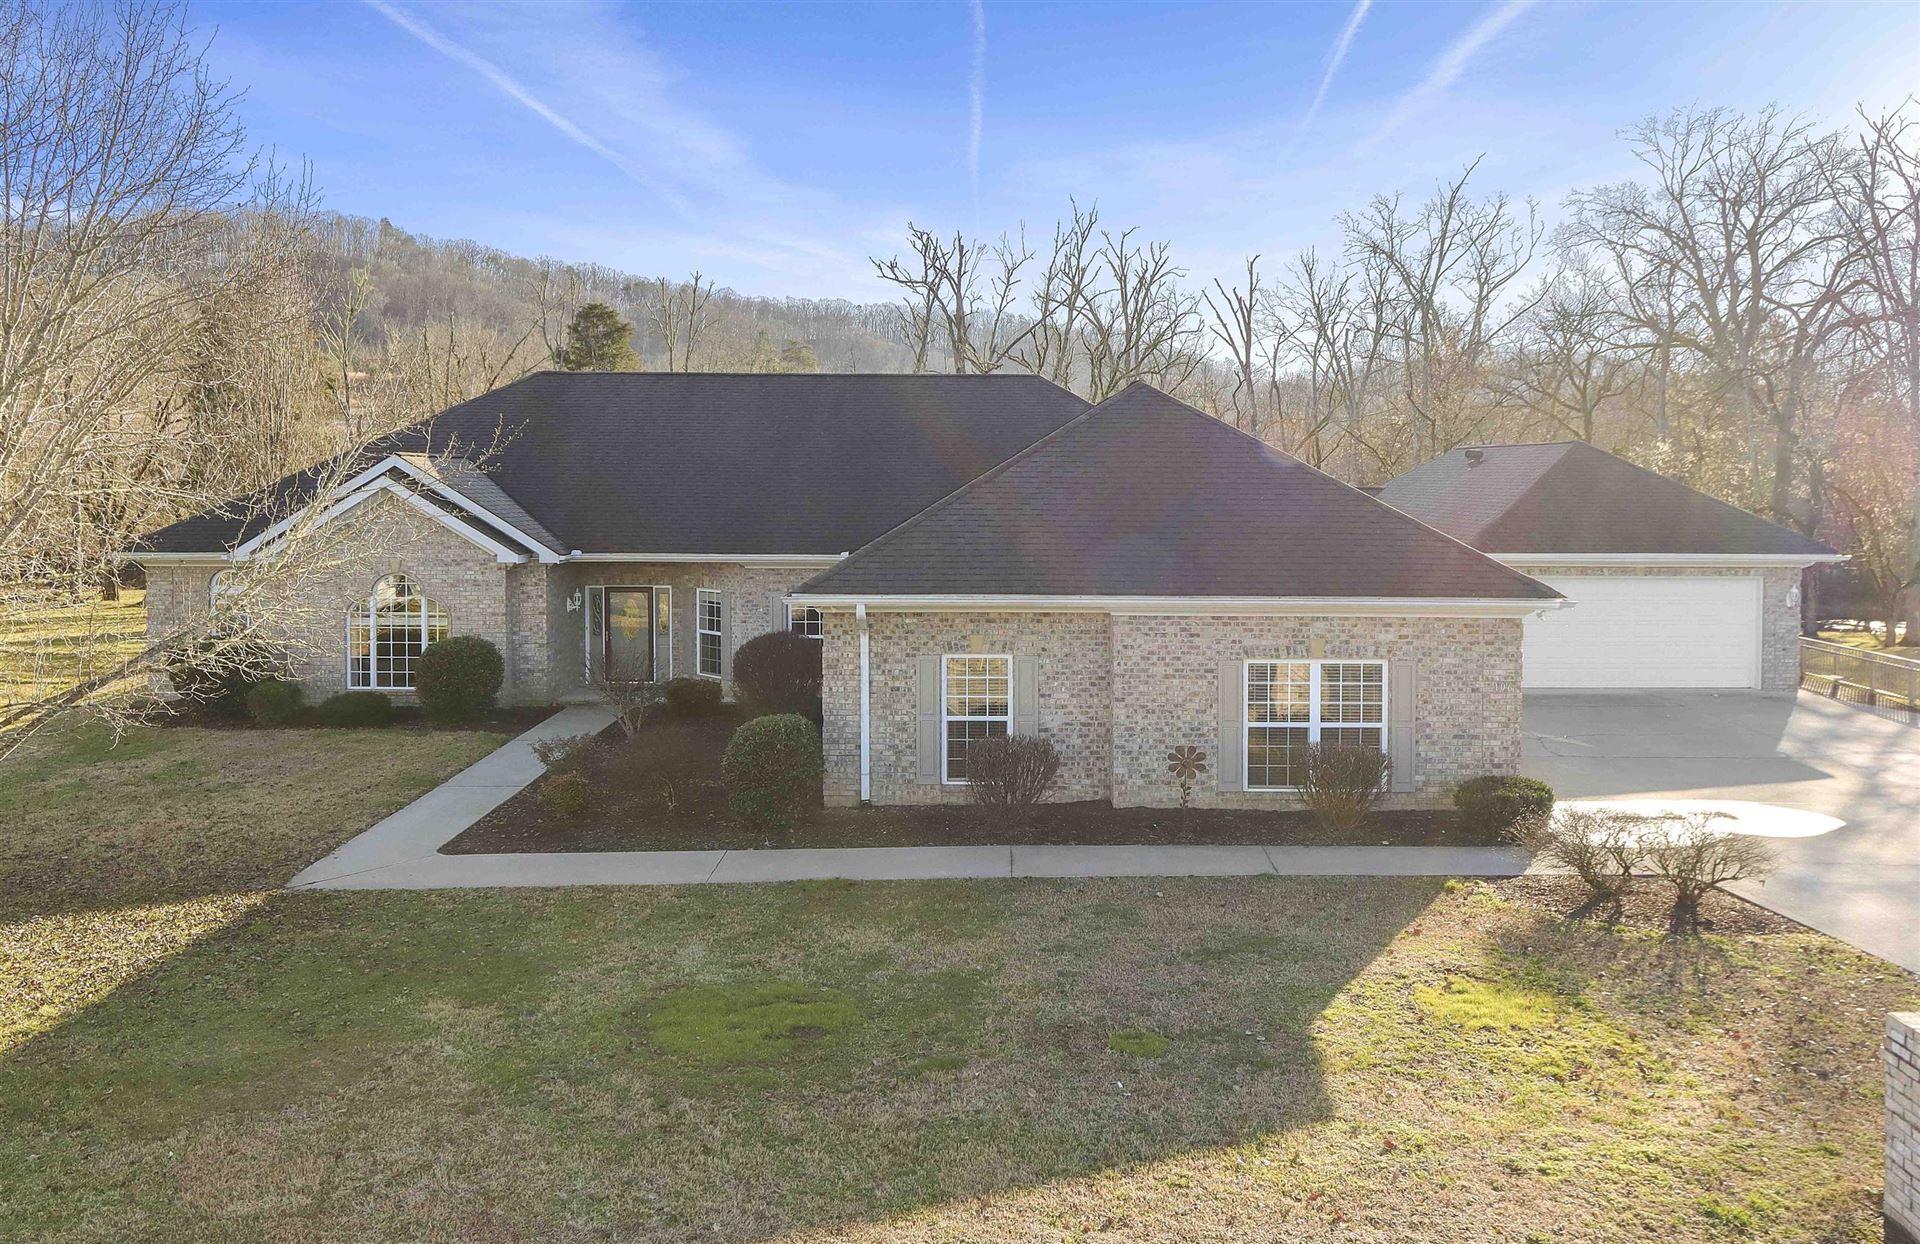 Photo of 106 E Southwood Lane, Oak Ridge, TN 37830 (MLS # 1140037)